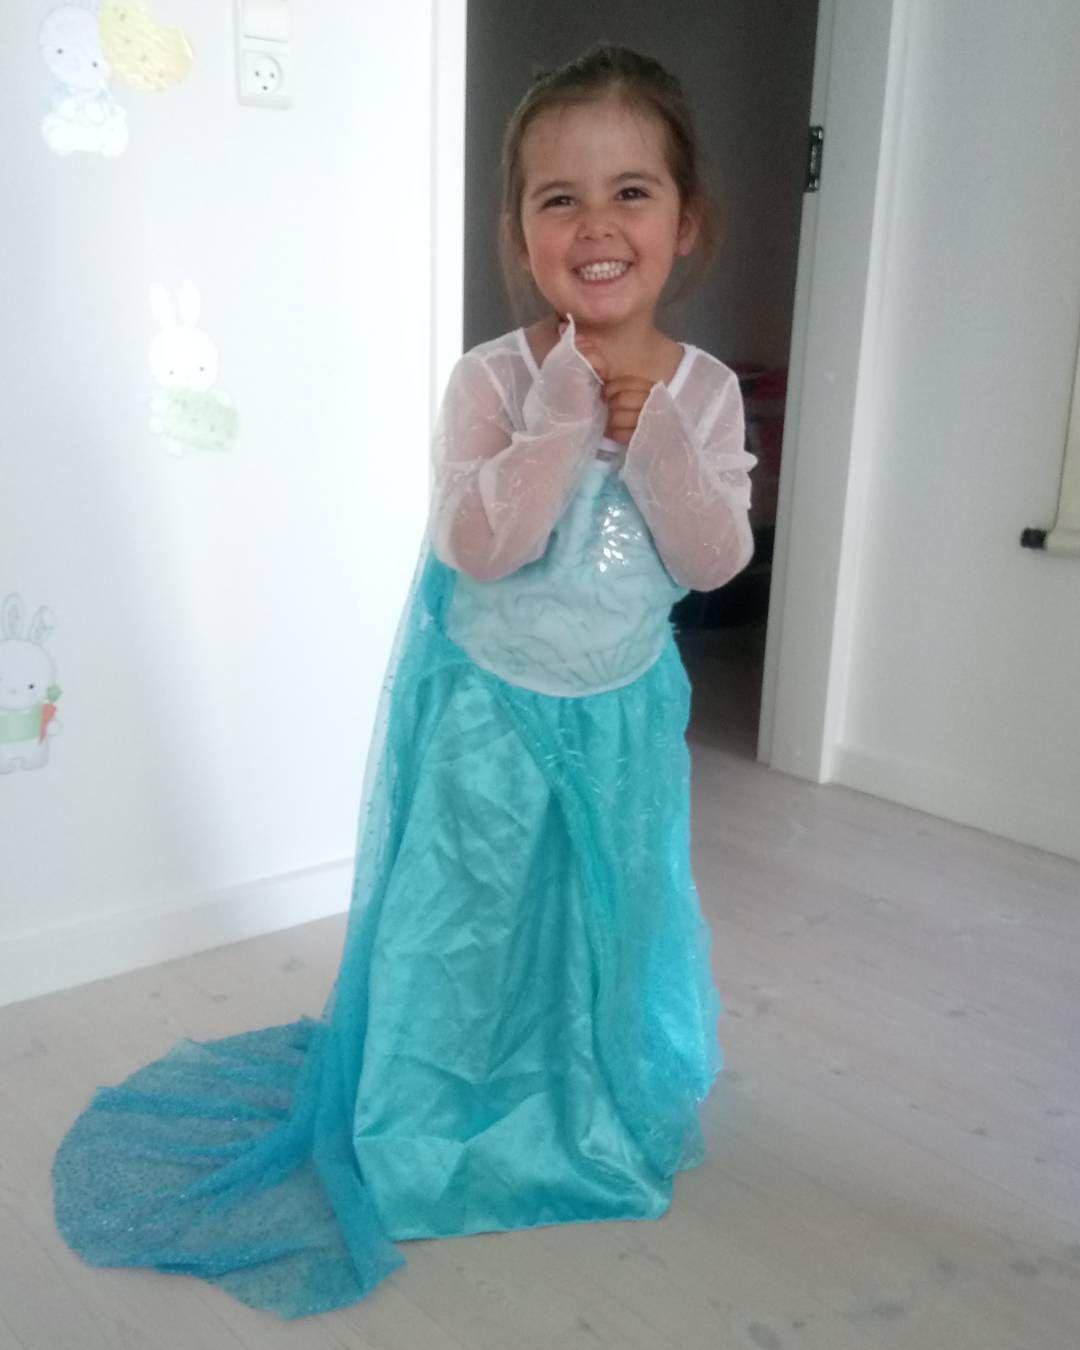 #frozen #elsa #prinsesse #sommersjov #leg #klædudtøjerdetsejeste #hygger #leger #letitgo ❤❤ http://misstagram.com/ipost/1555196823307394373/?code=BWVK0VhDZ1F